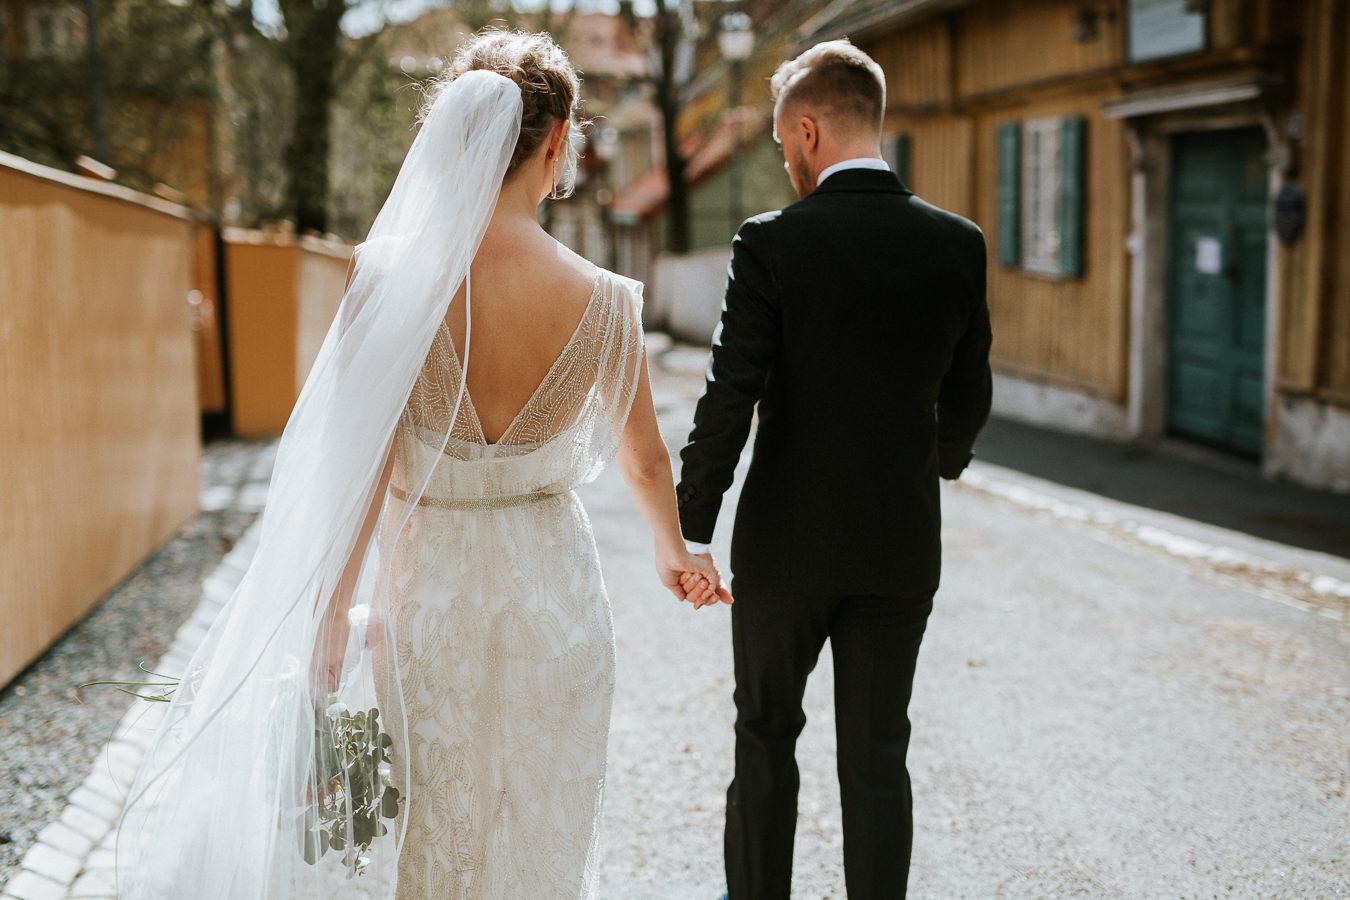 Tone-Tvedt-bryllup-fotograf-månefisken-113.jpg